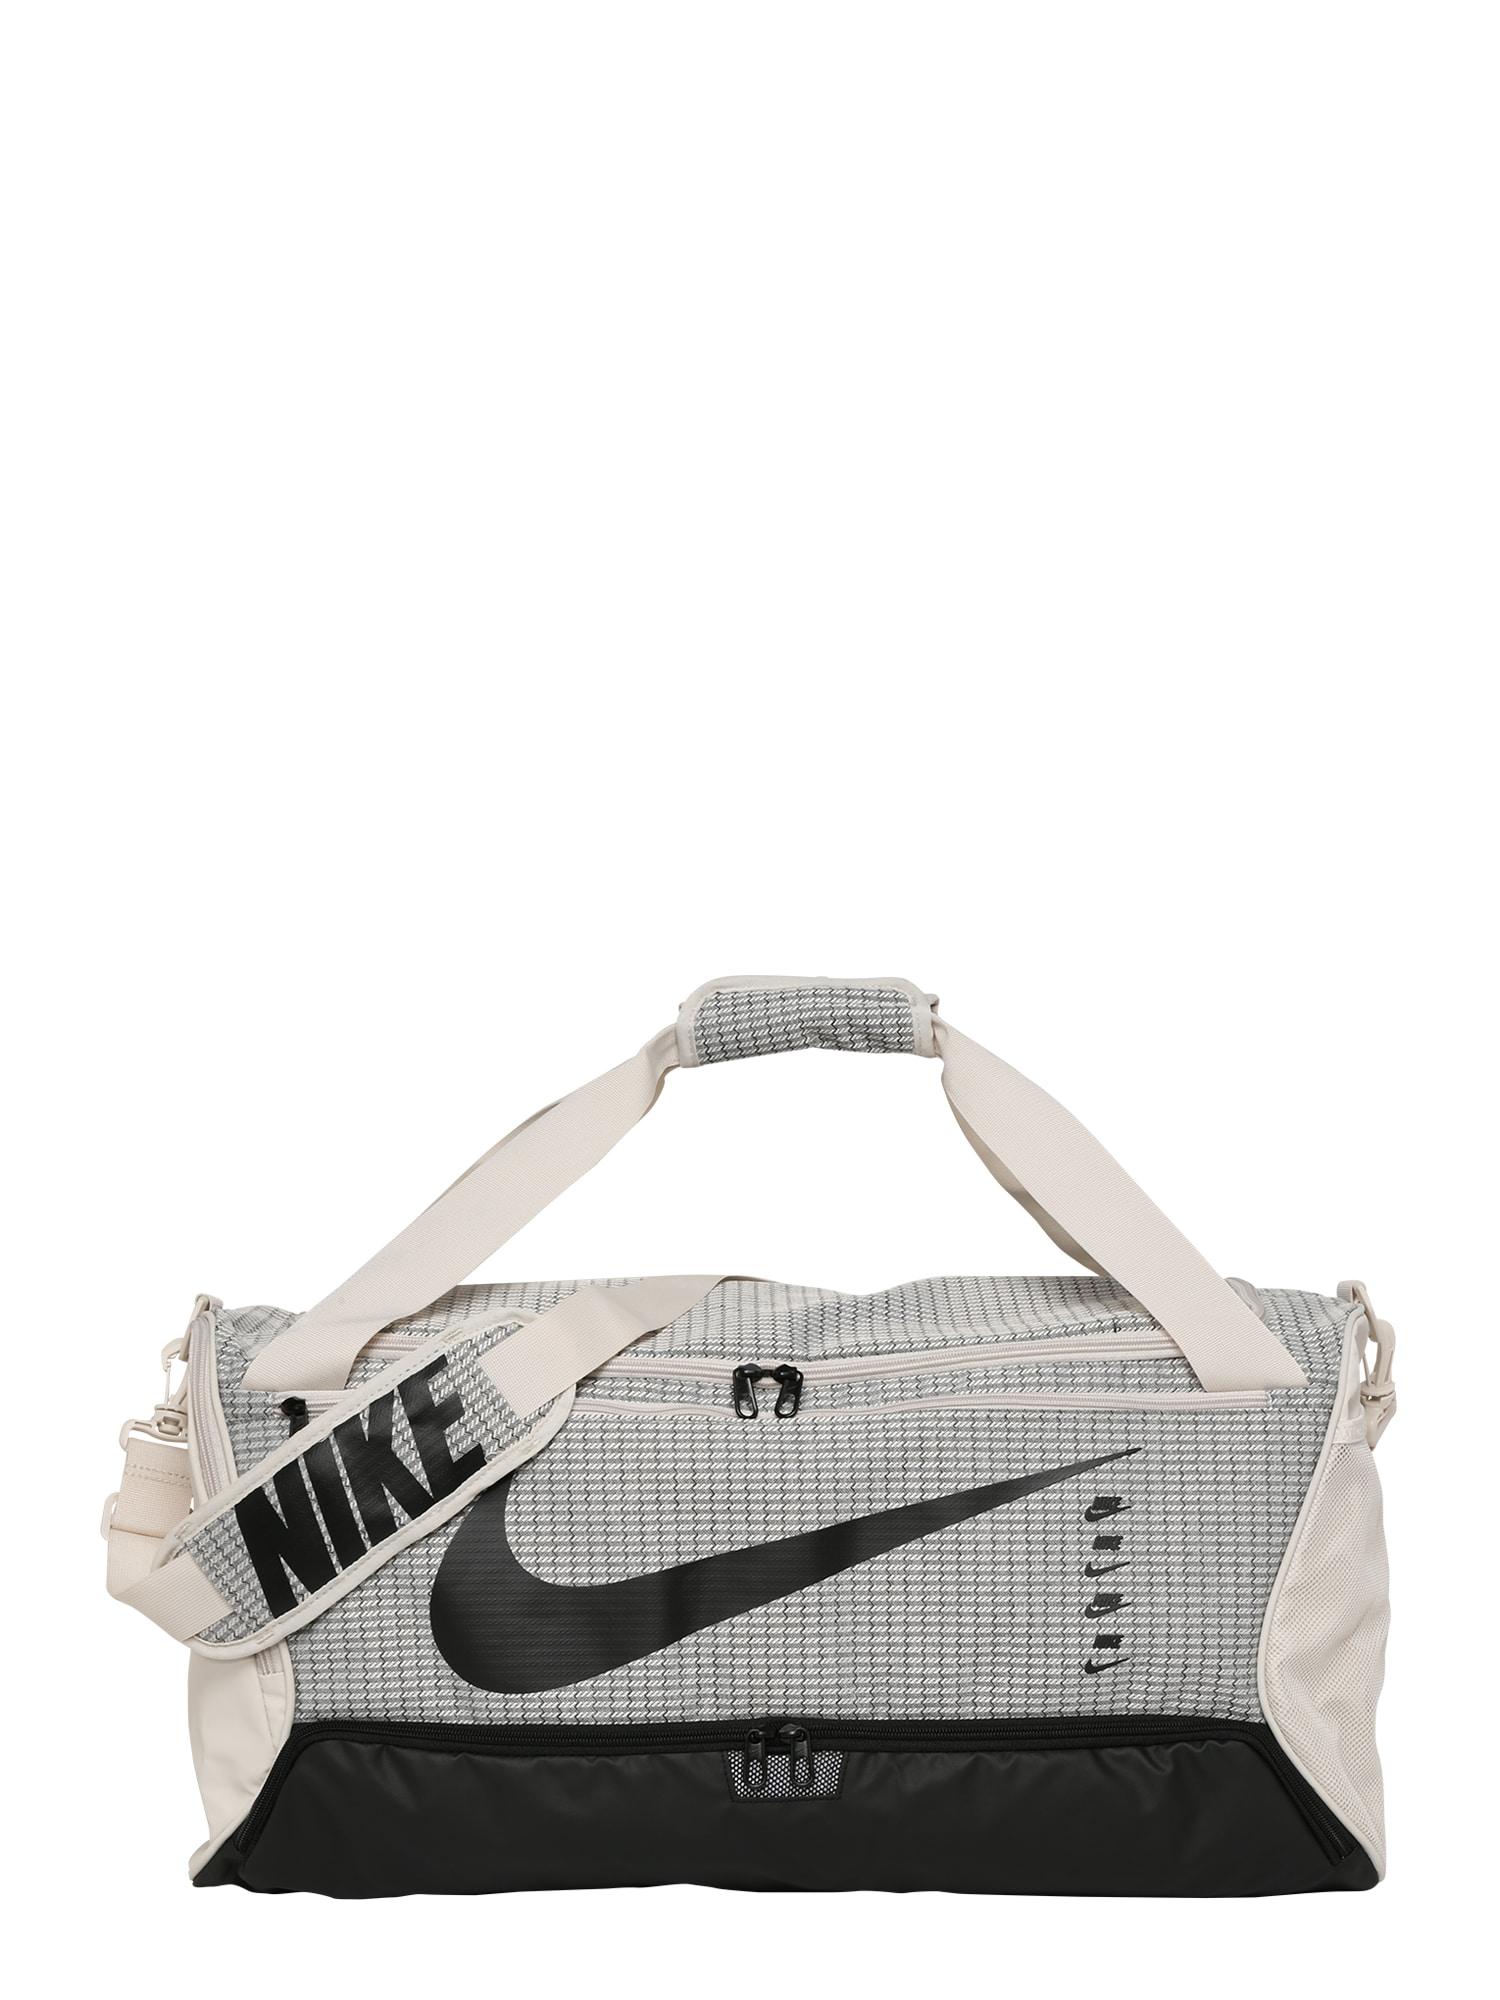 NIKE Sportovní taška 'Brasilia 9.0'  černá / barva bílé vlny / šedá